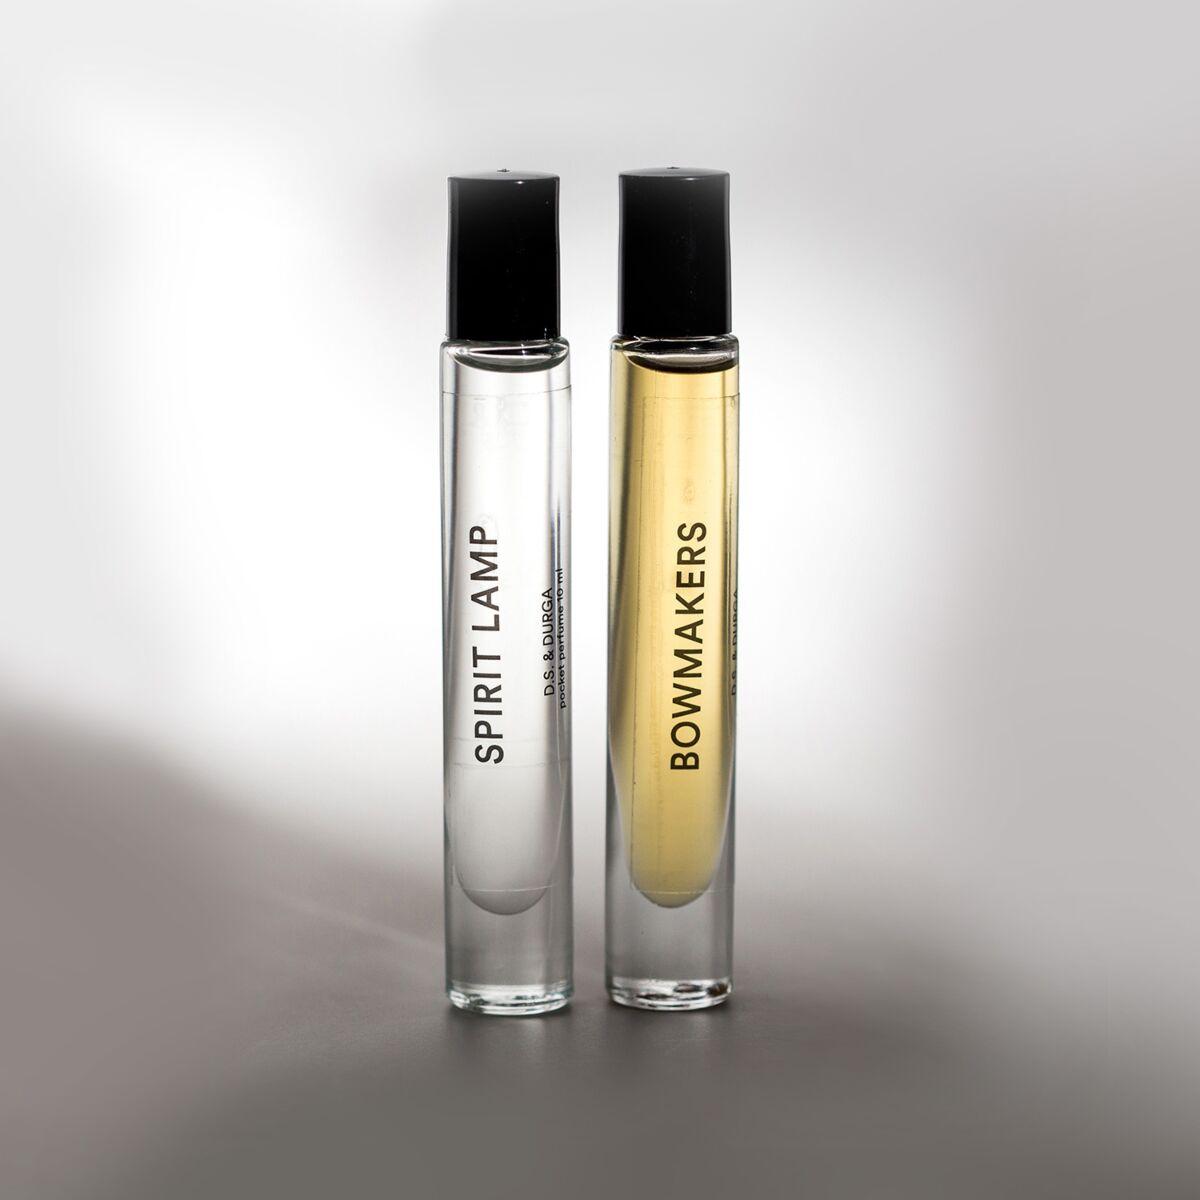 Bowmakers Pocket Perfume Roller image